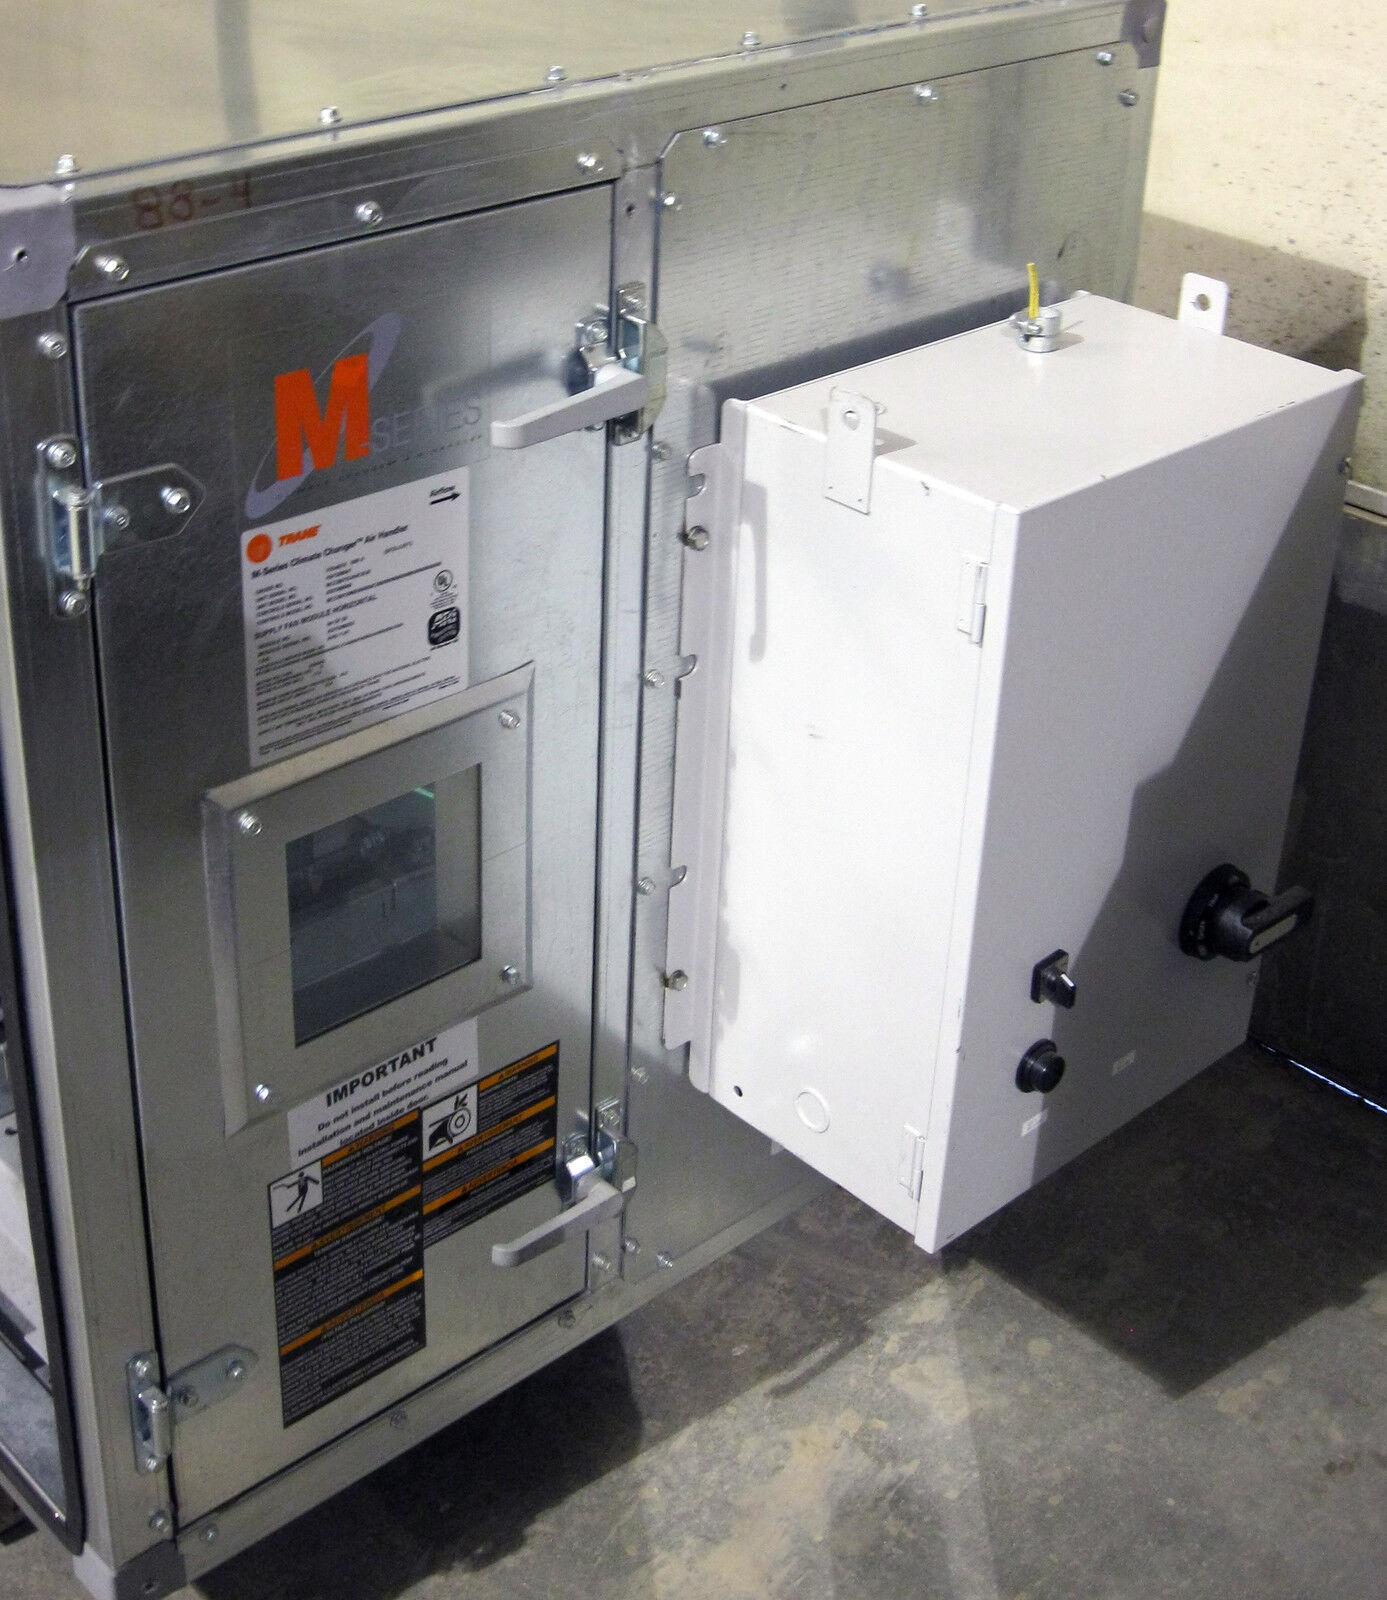 trane m series air handler. pic of trane m series applied central station climate changer air handler #793e27 1387 1600 i